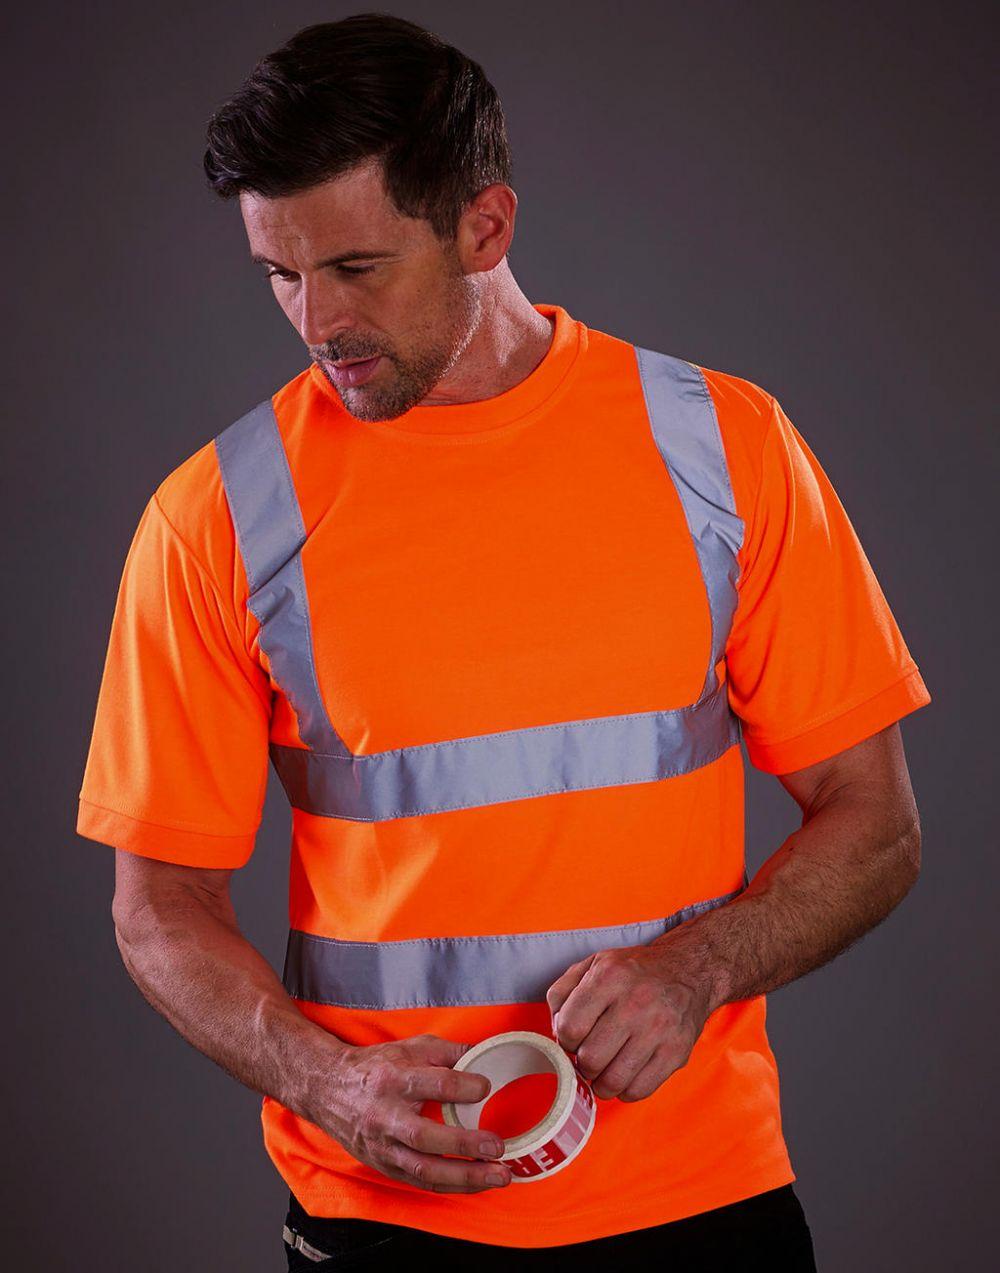 Camisetas reflectantes yoko fluo imagen 1